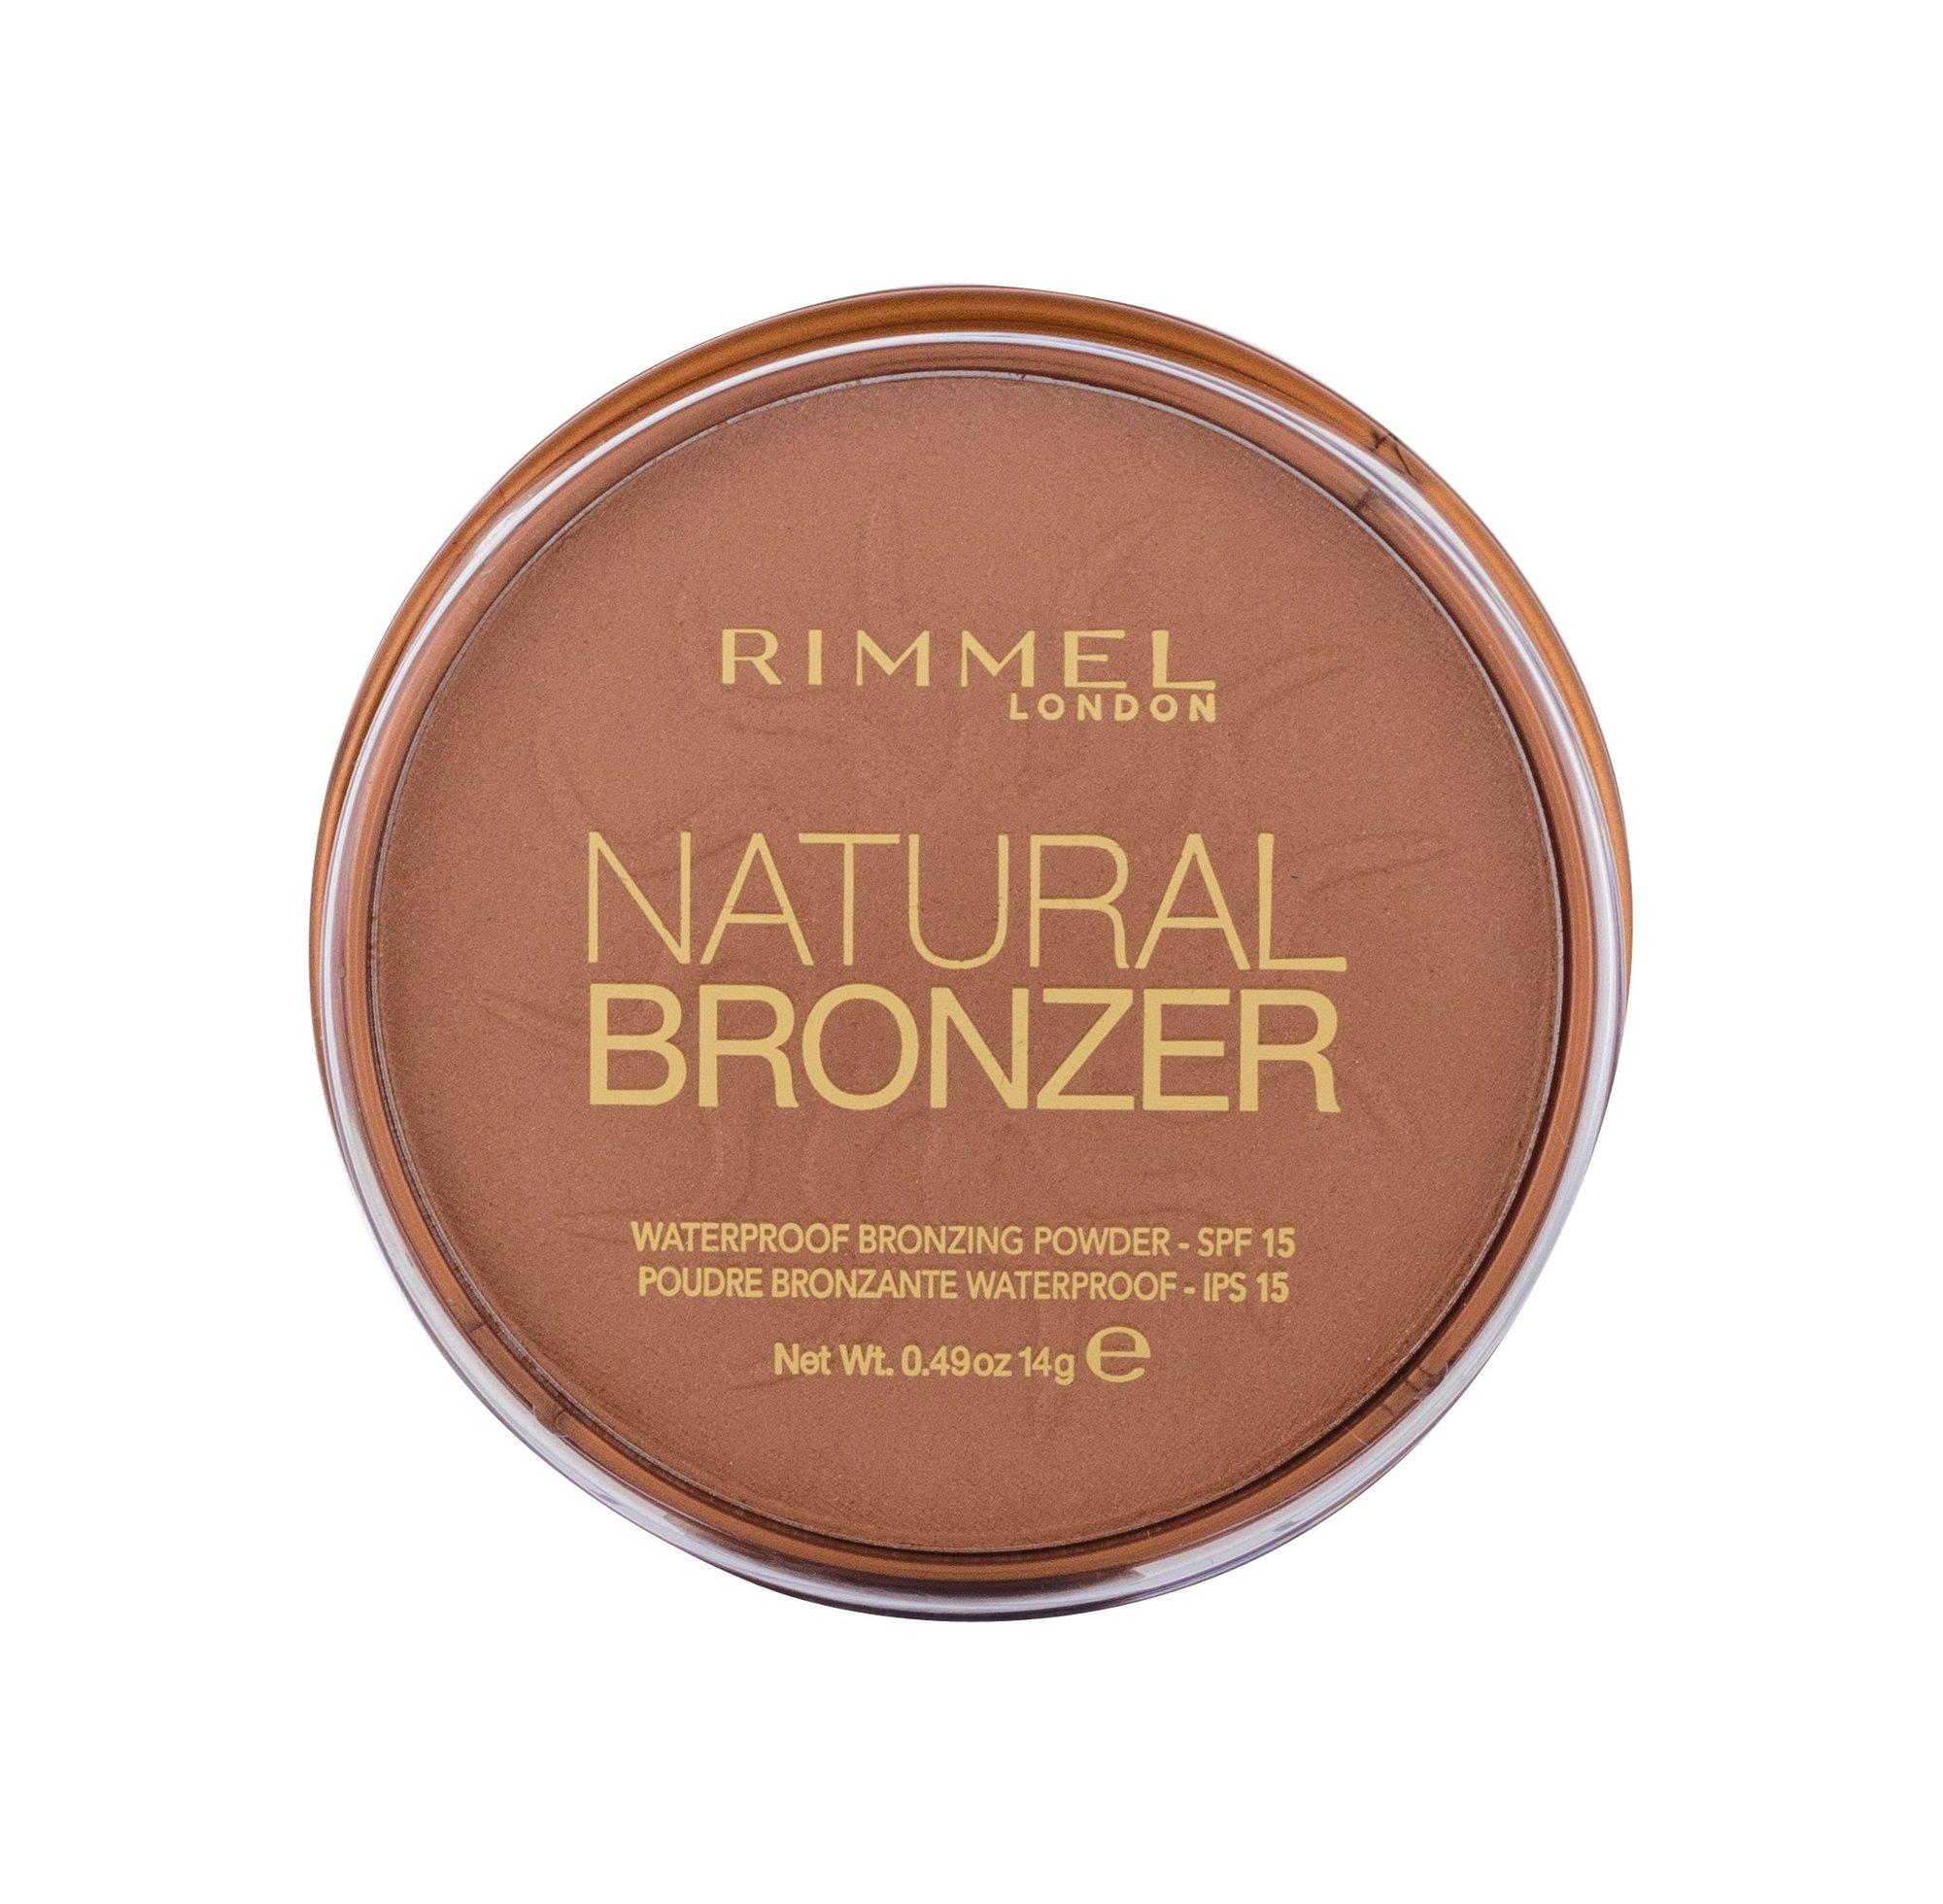 Rimmel London Natural Bronzer Bronzer 14ml 027 Sun Dance